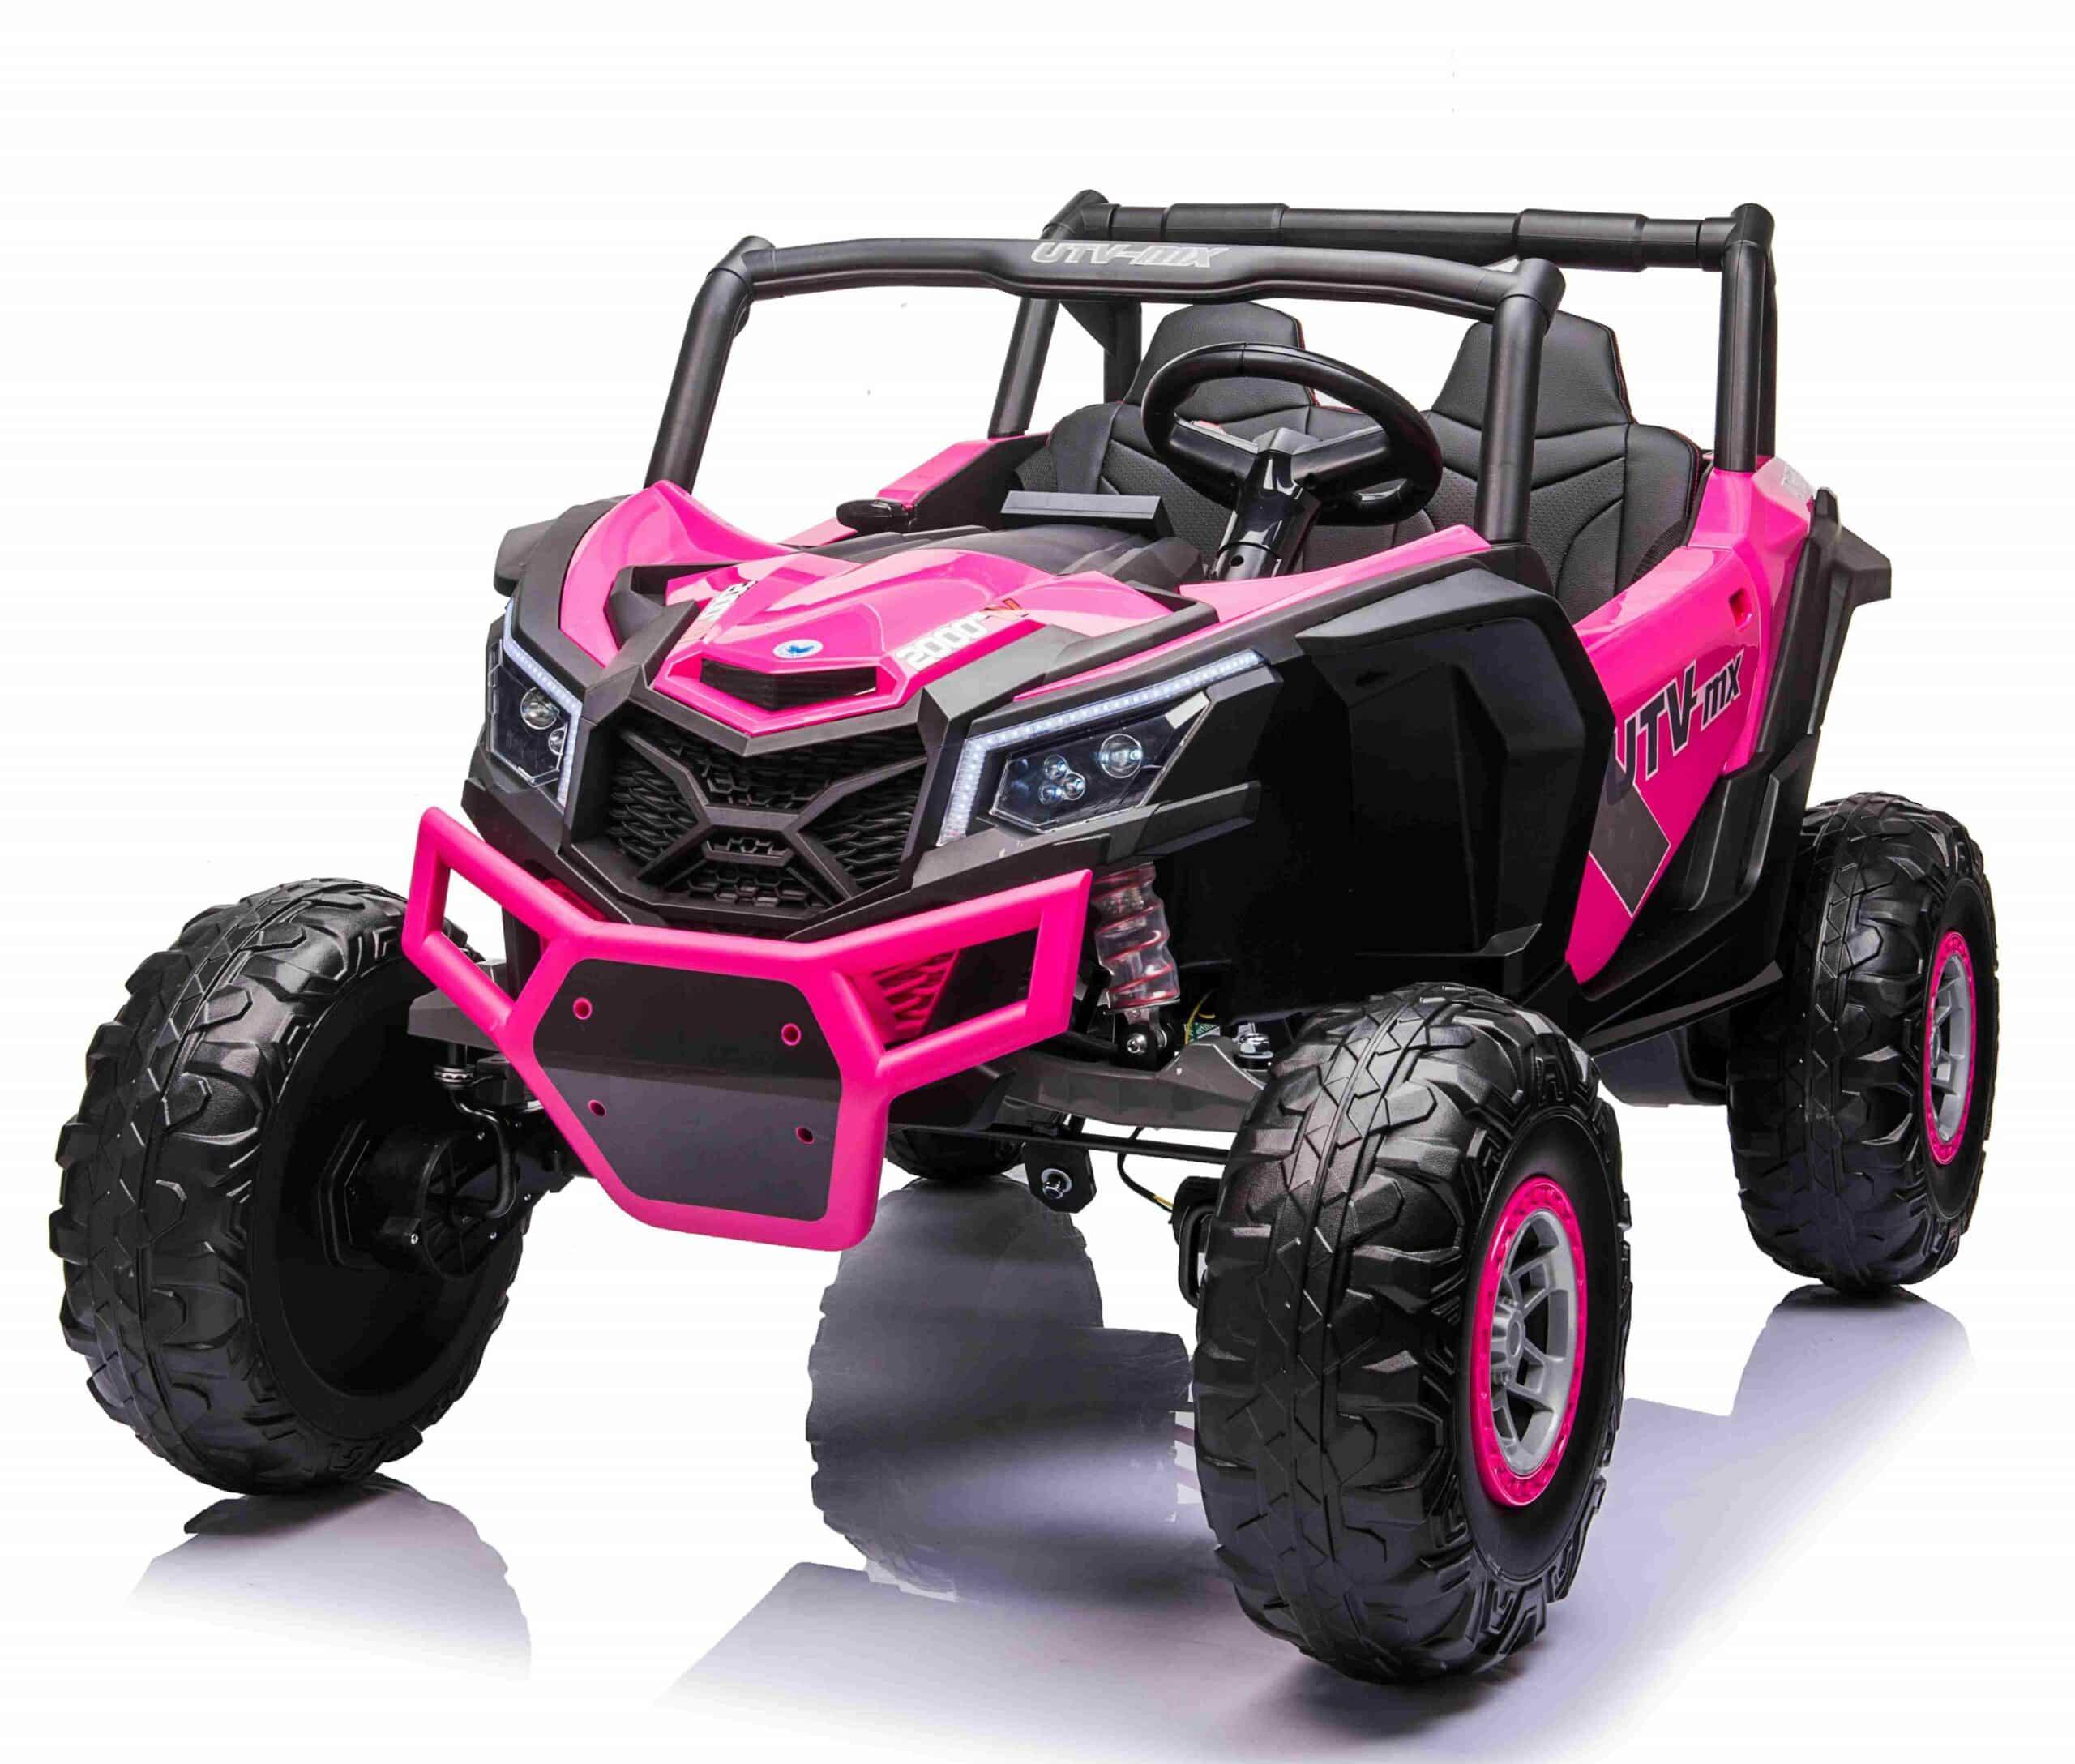 Utv-mx 2021 2 Seater 24v Kids Electric Ride On Bugy Rose Pink